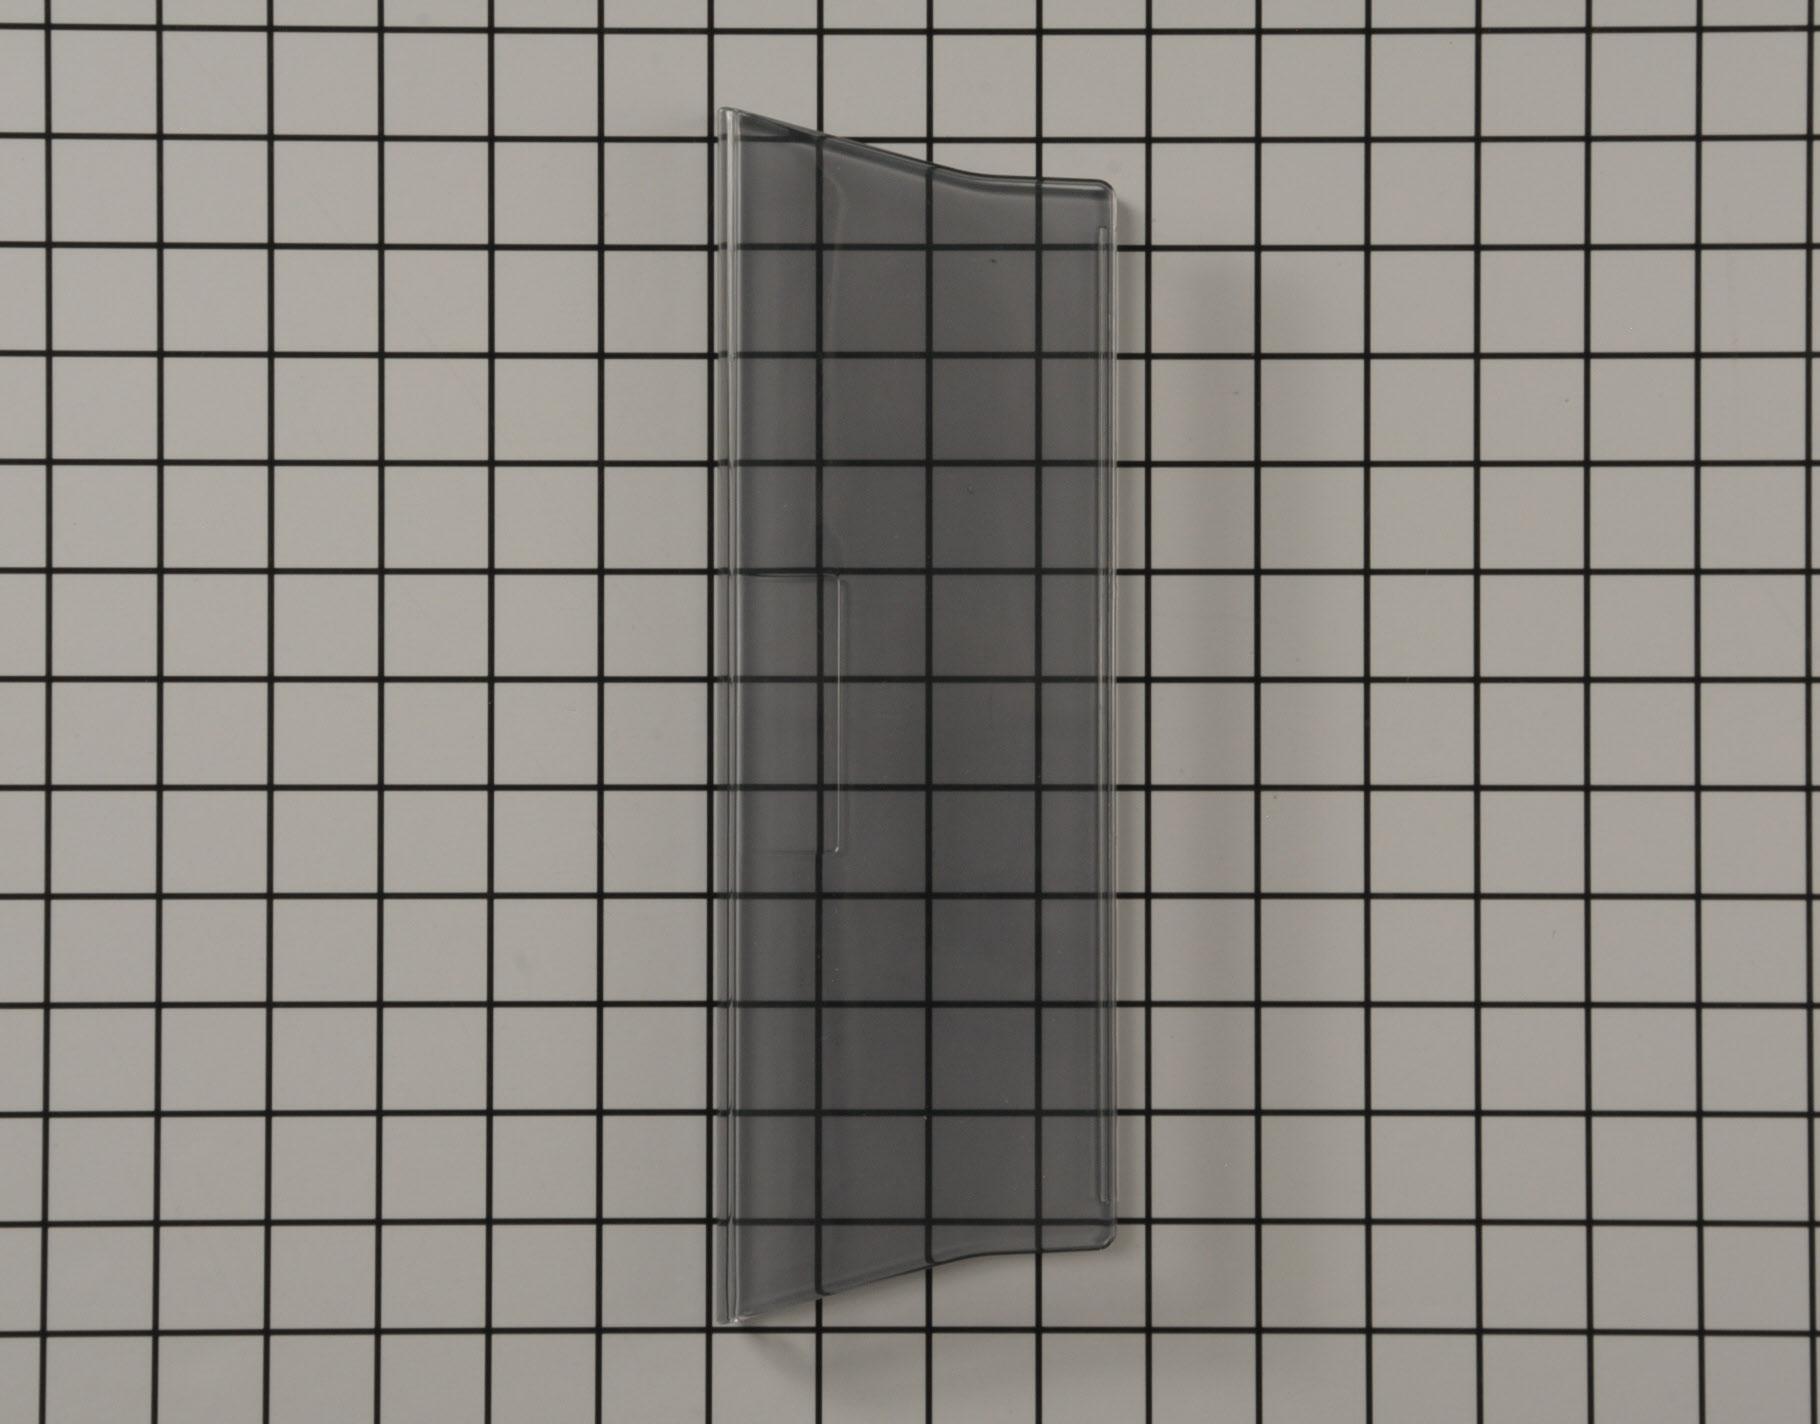 Whirlpool Refrigerator Part # W11026309 - Drawer Divider